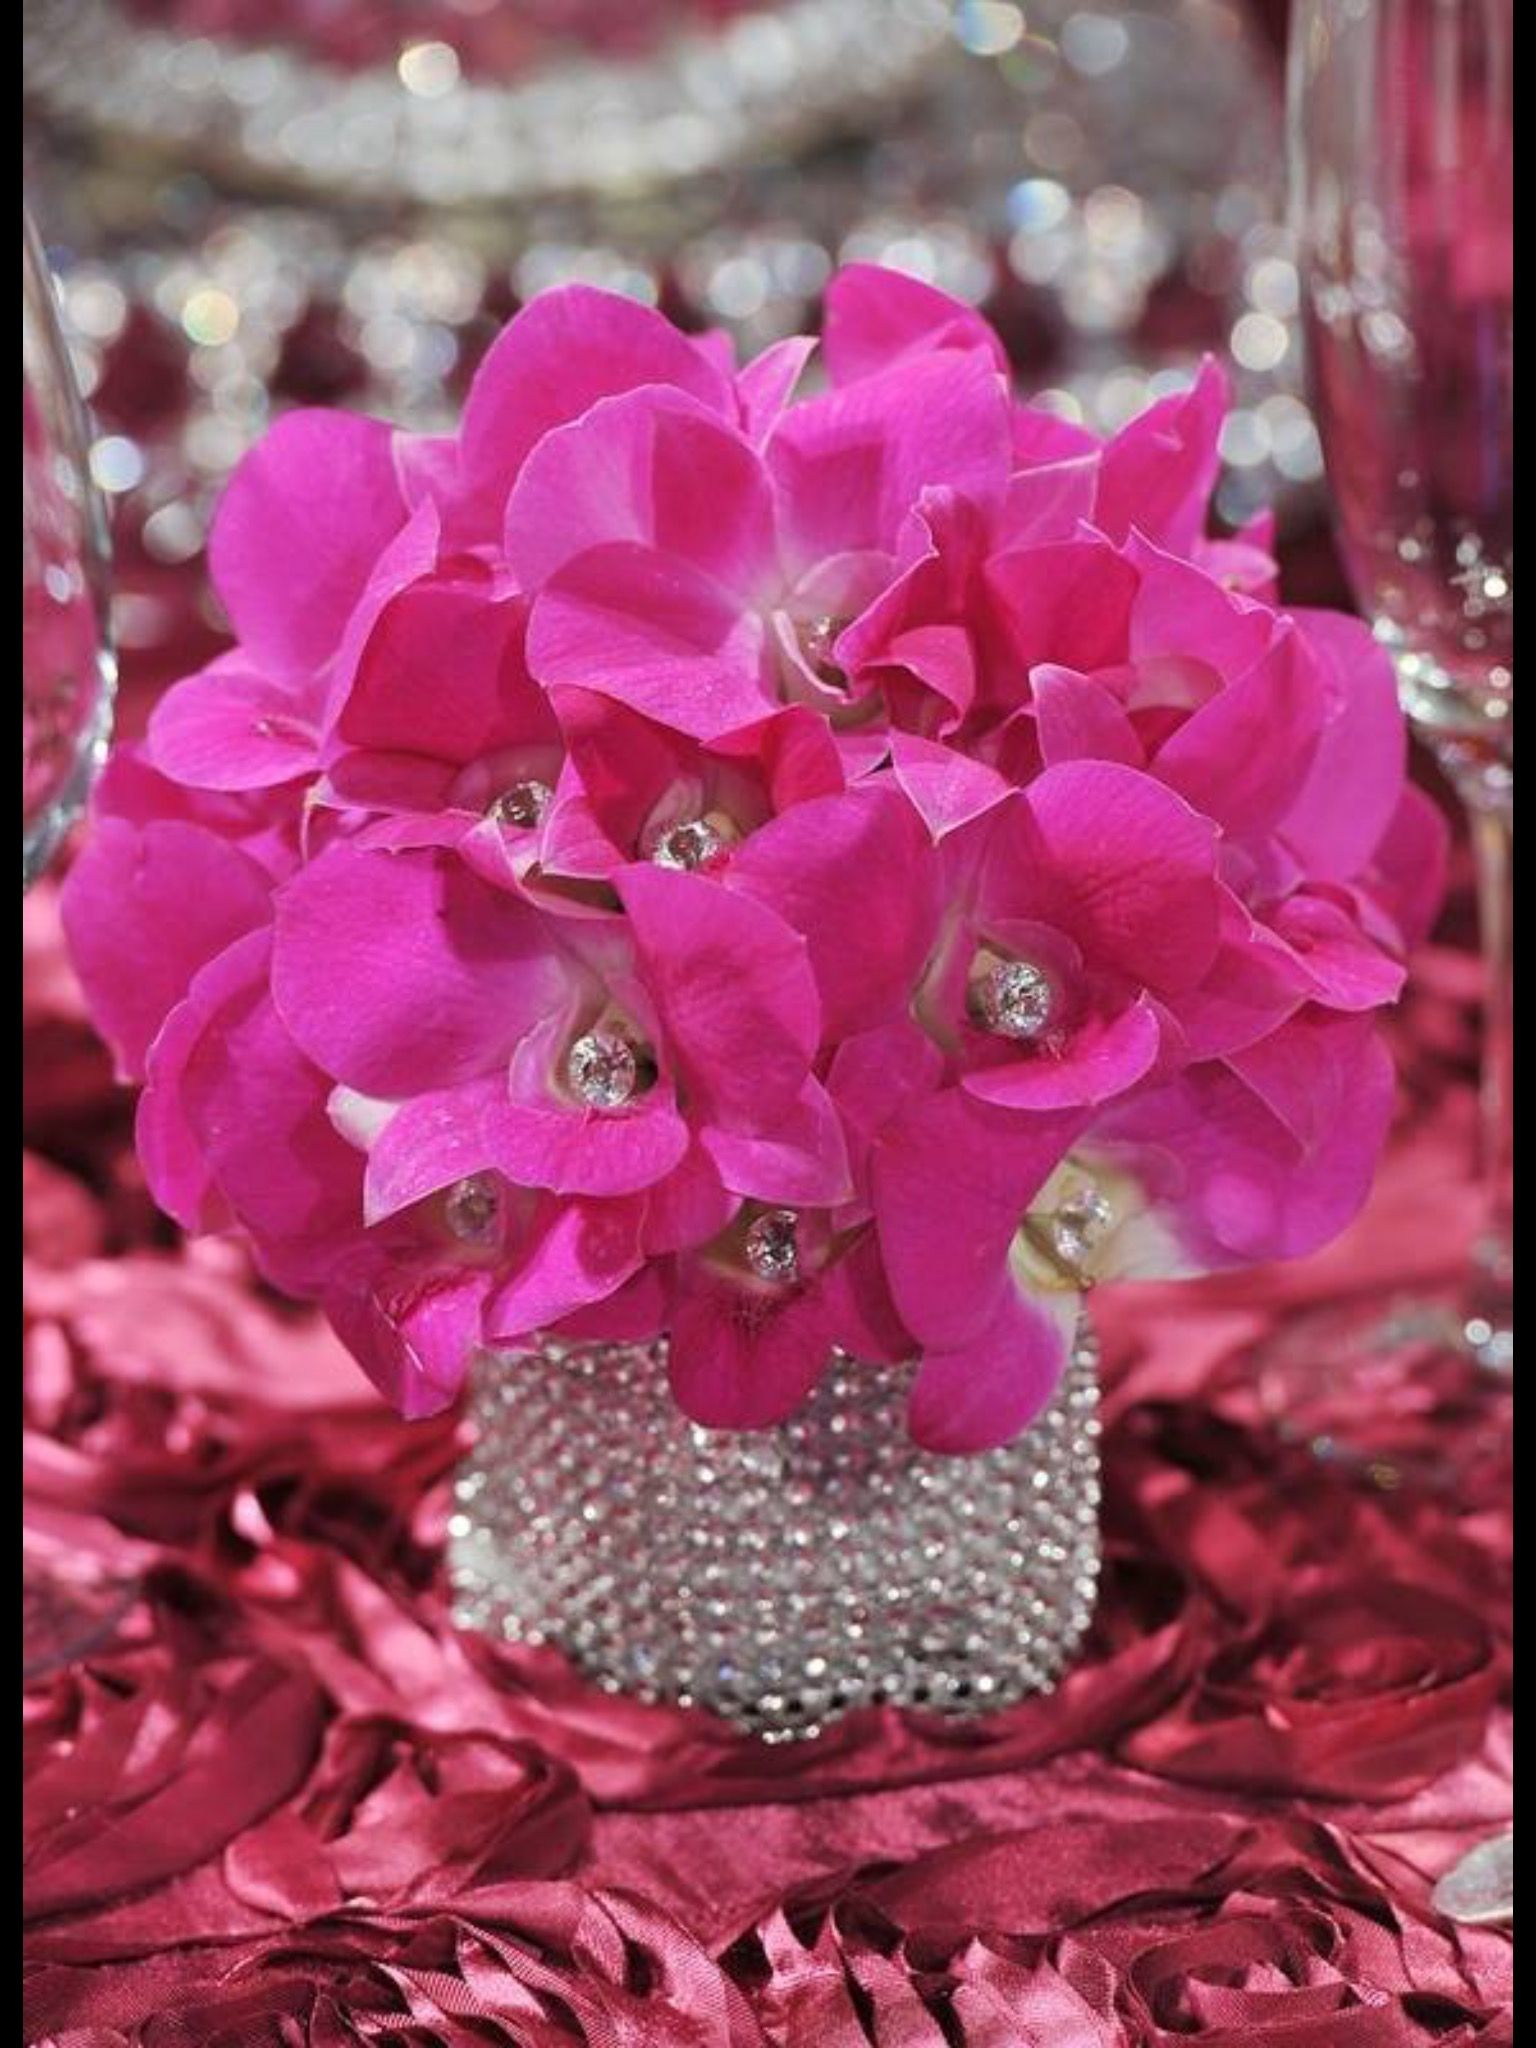 Pin by Elizabeth Walkonis on Wedding | Pinterest | Wedding